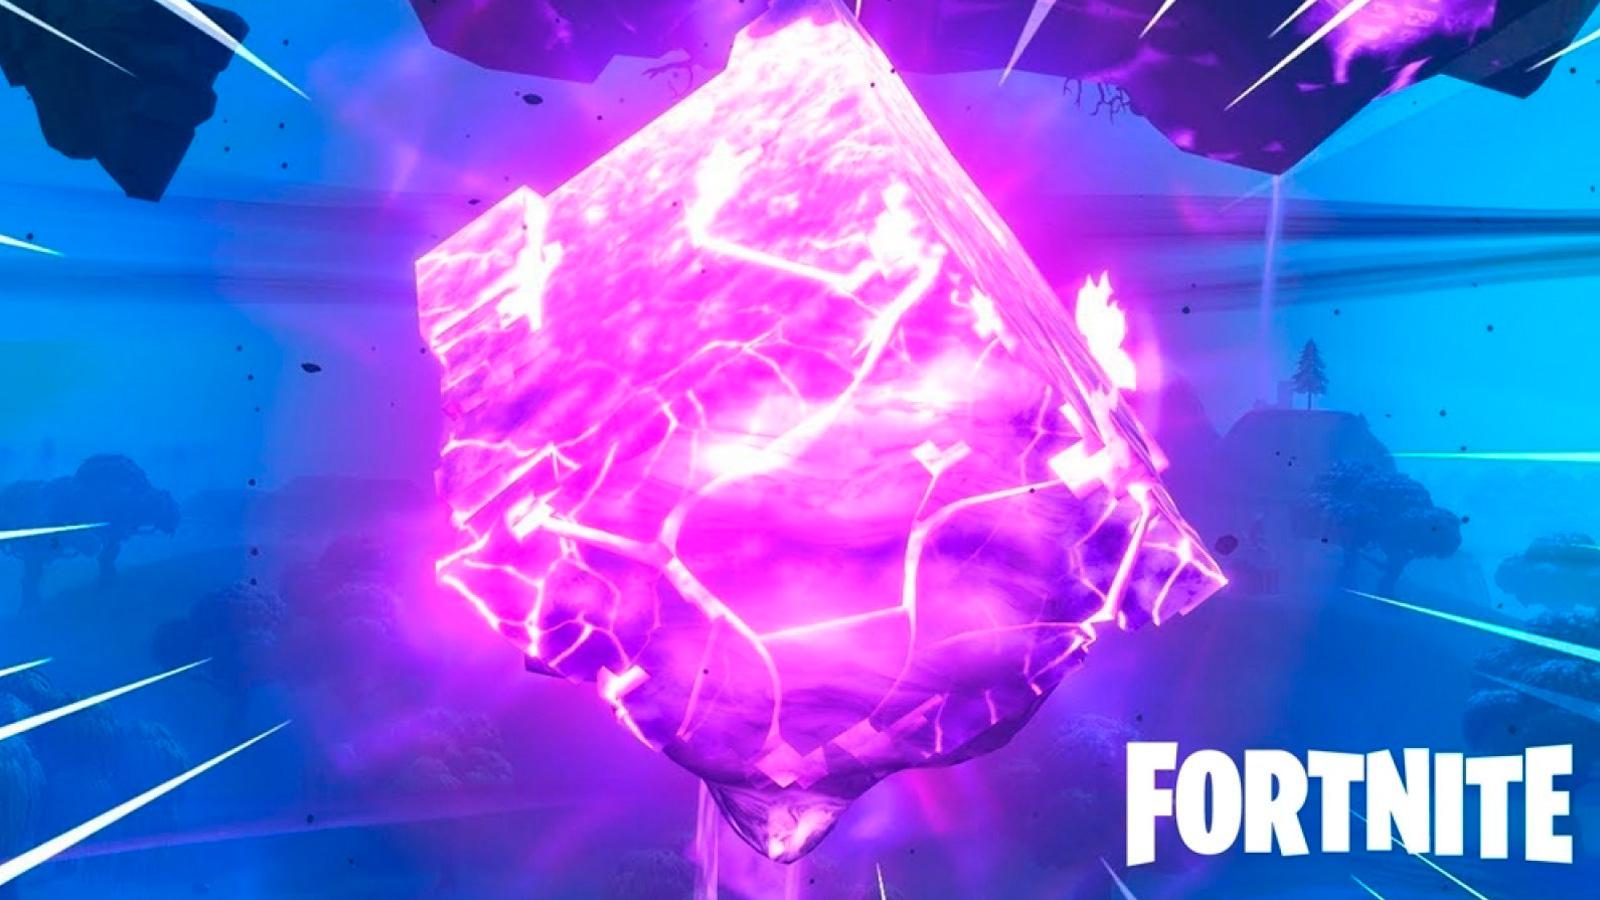 Kevin el Cubo en Fortnite